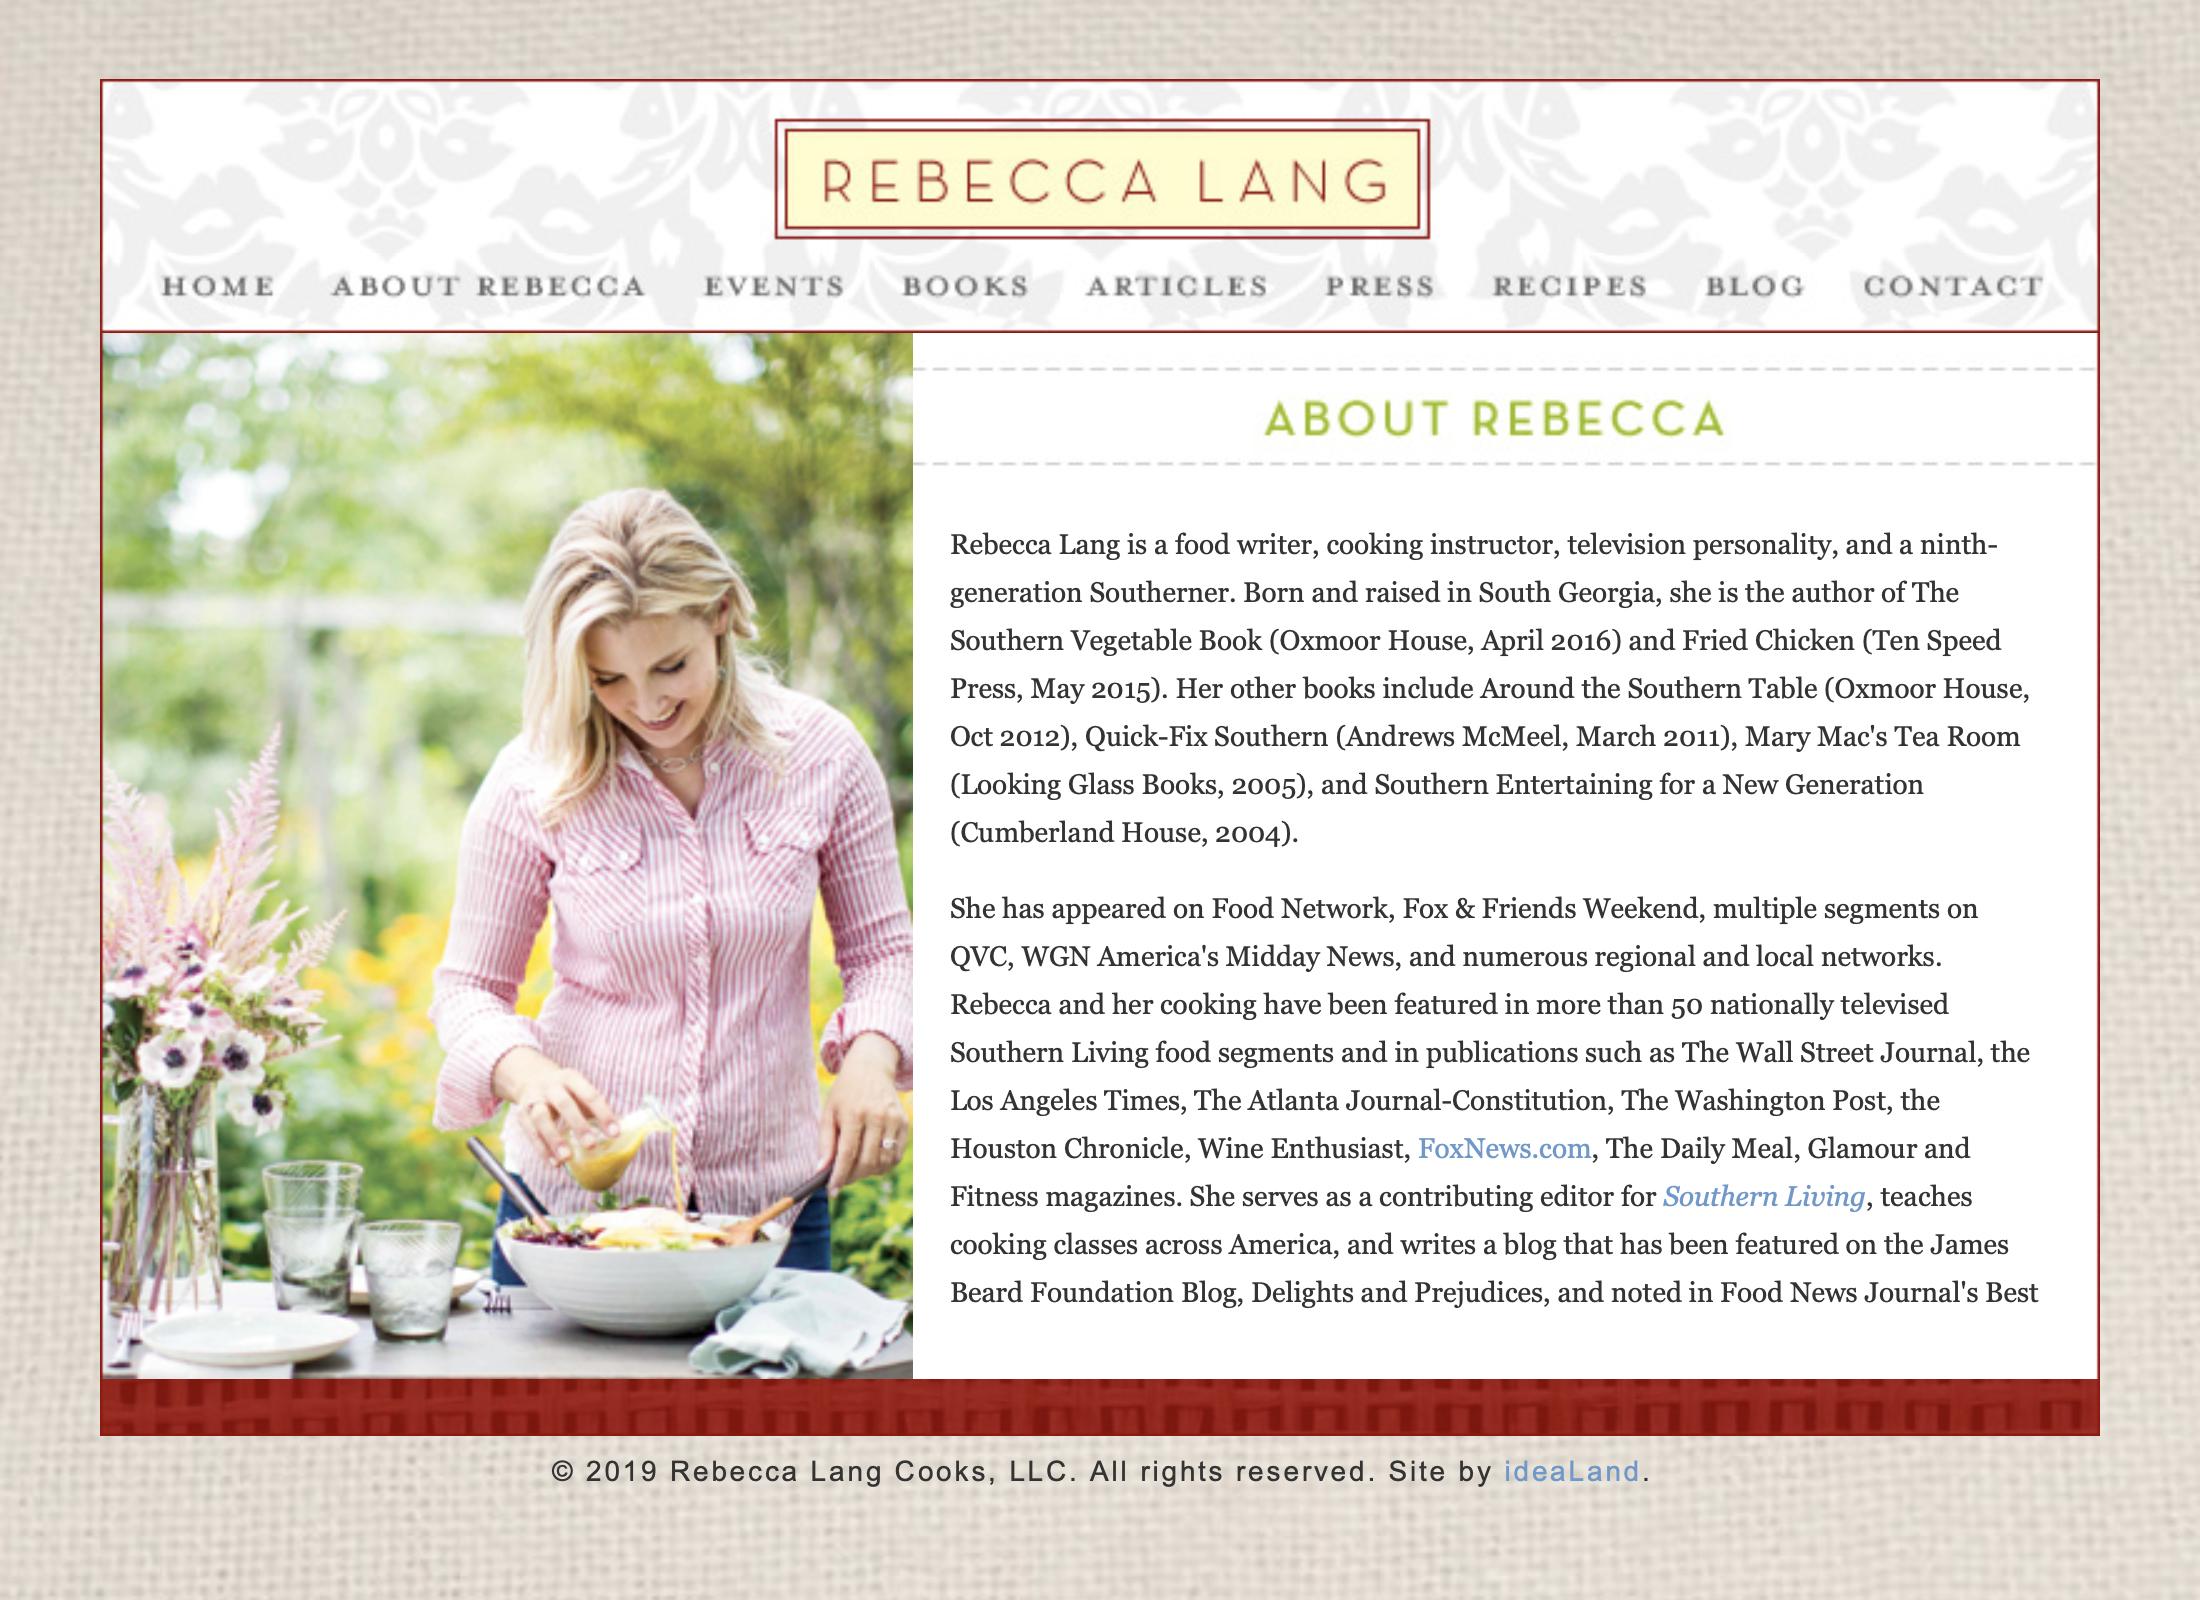 RebeccaLang_Web2.jpg